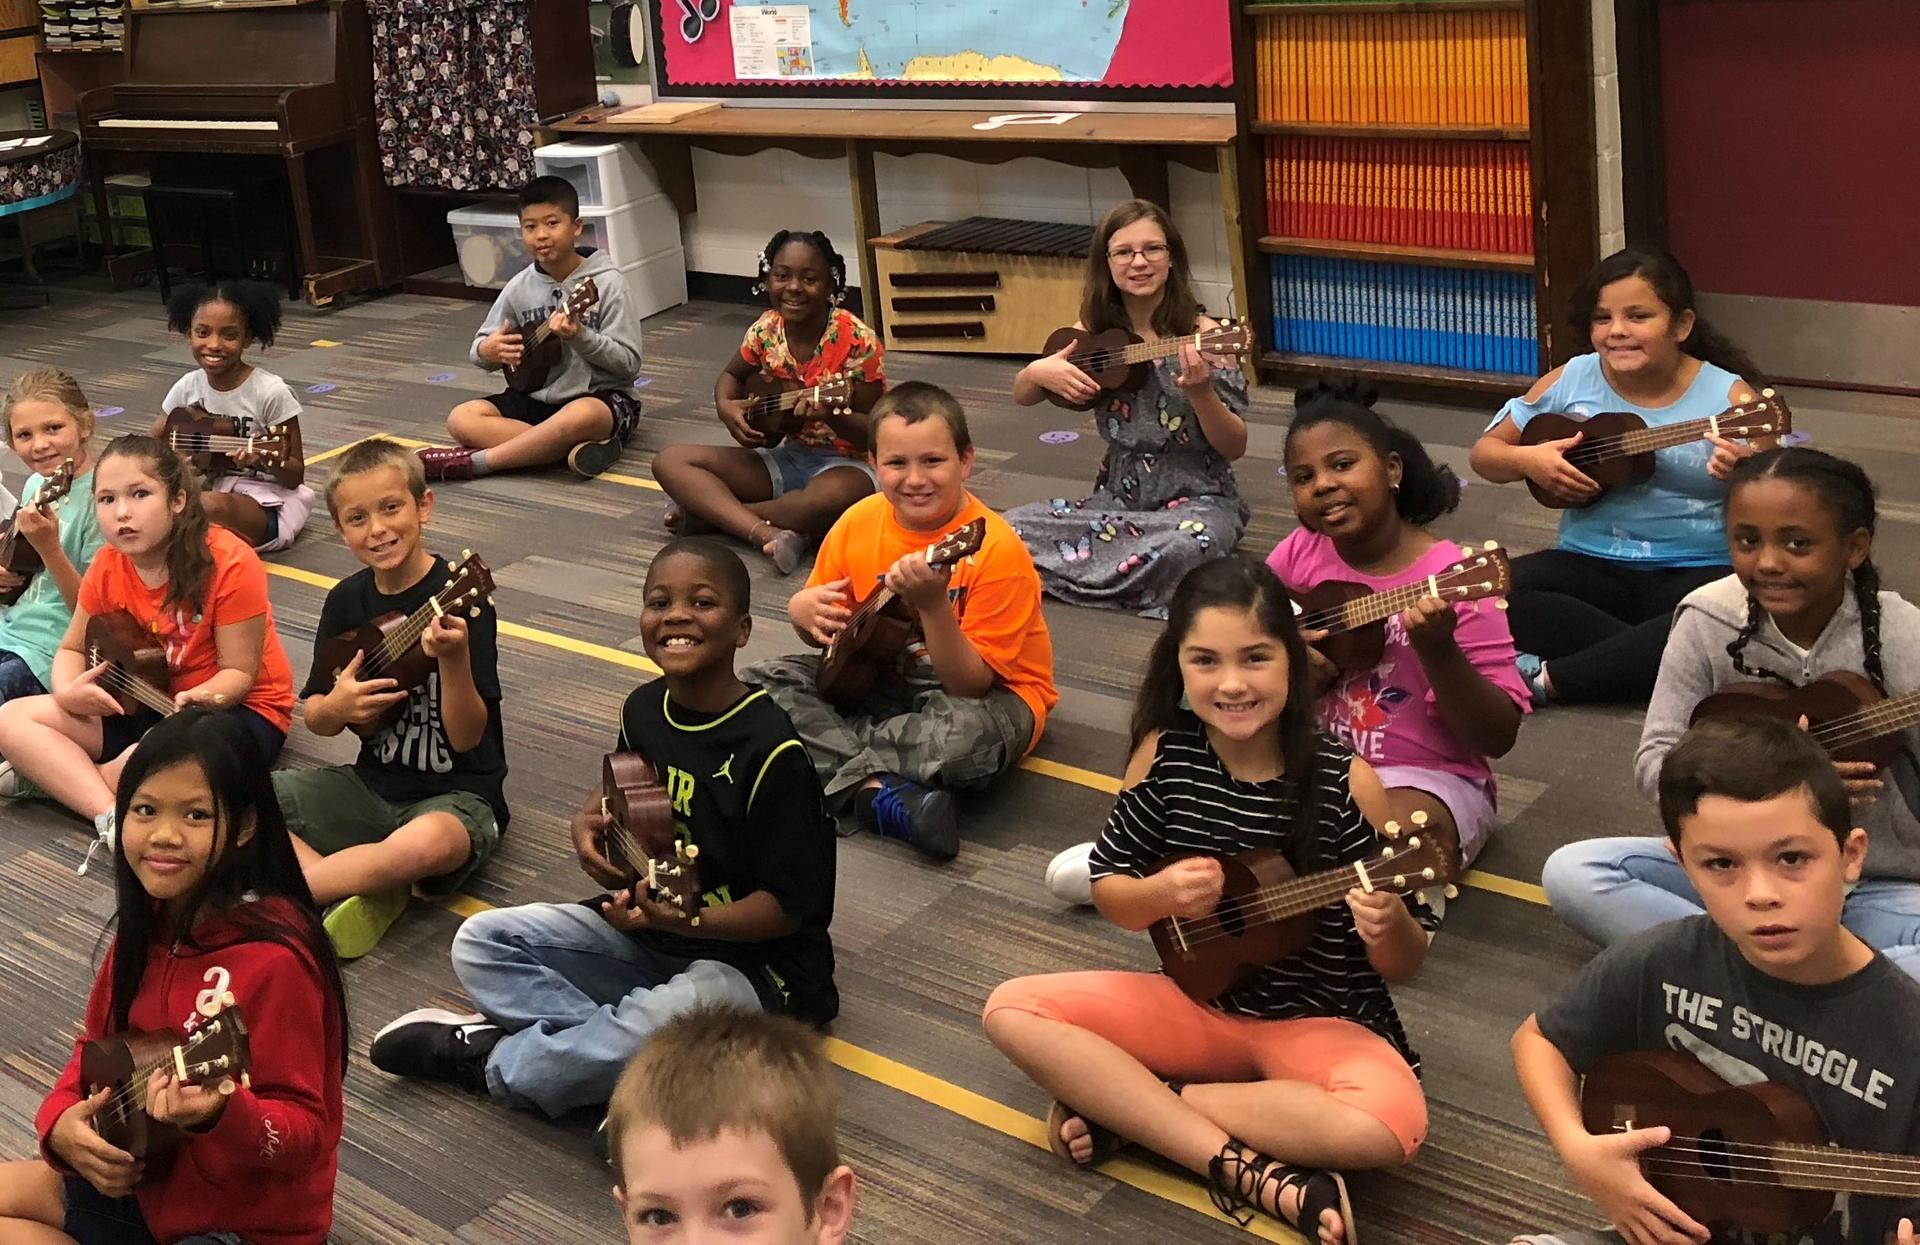 4th graders playing the ukulele